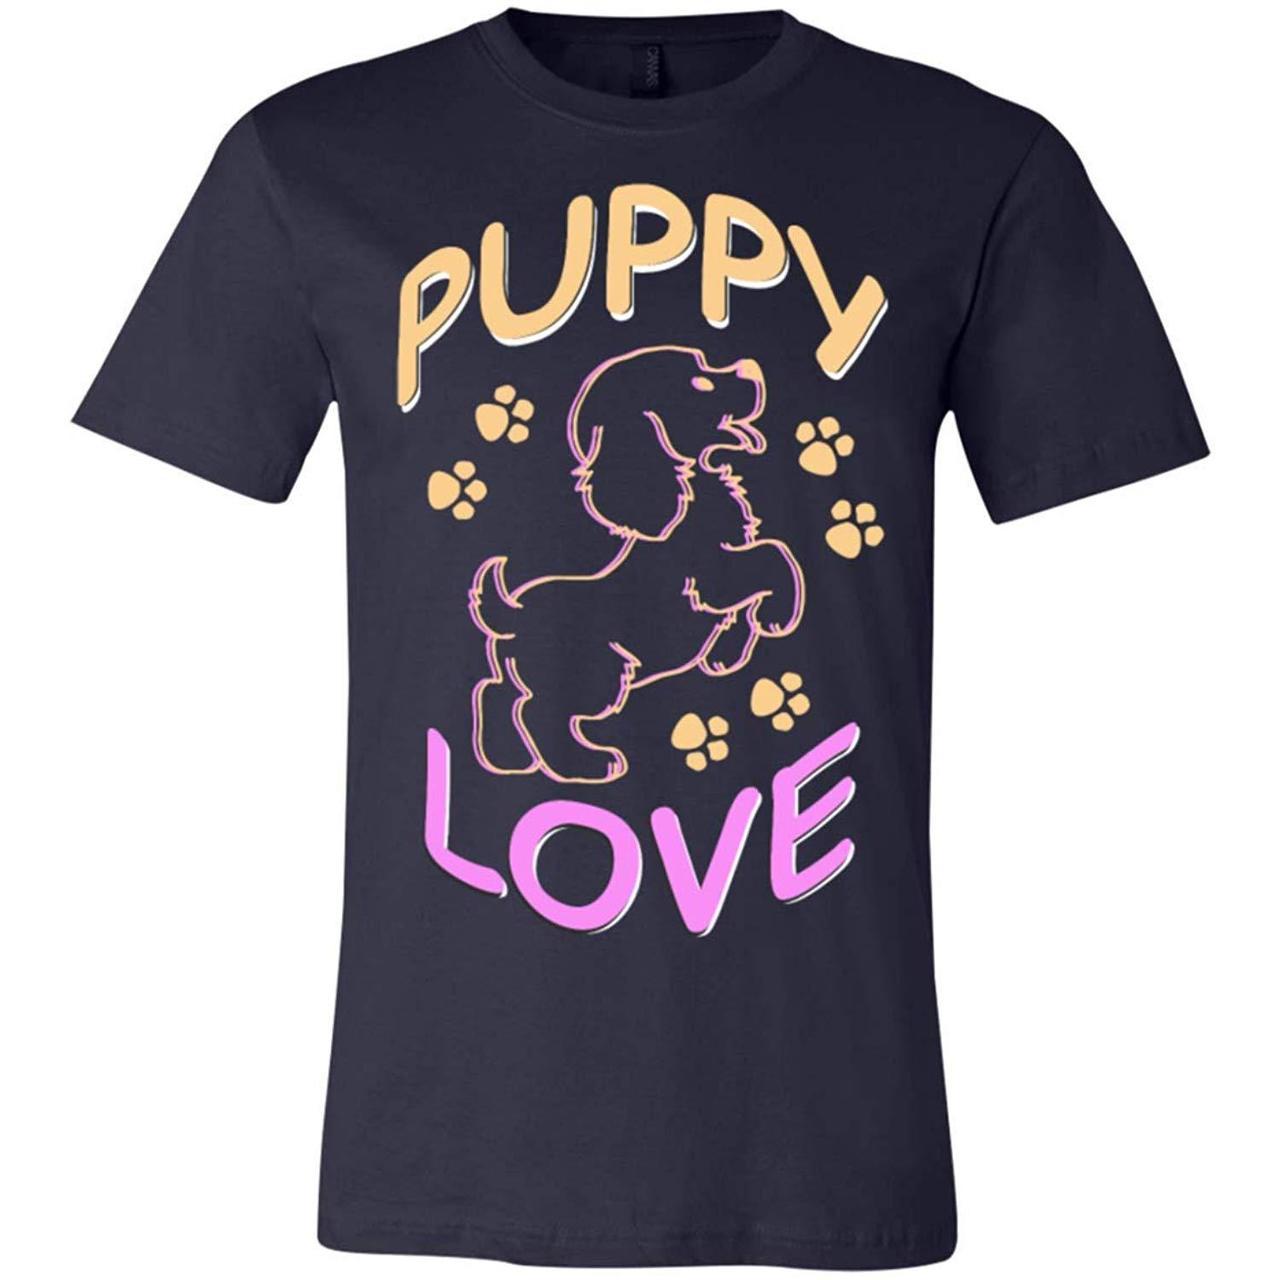 Puppylove Funny Pug Tshirt